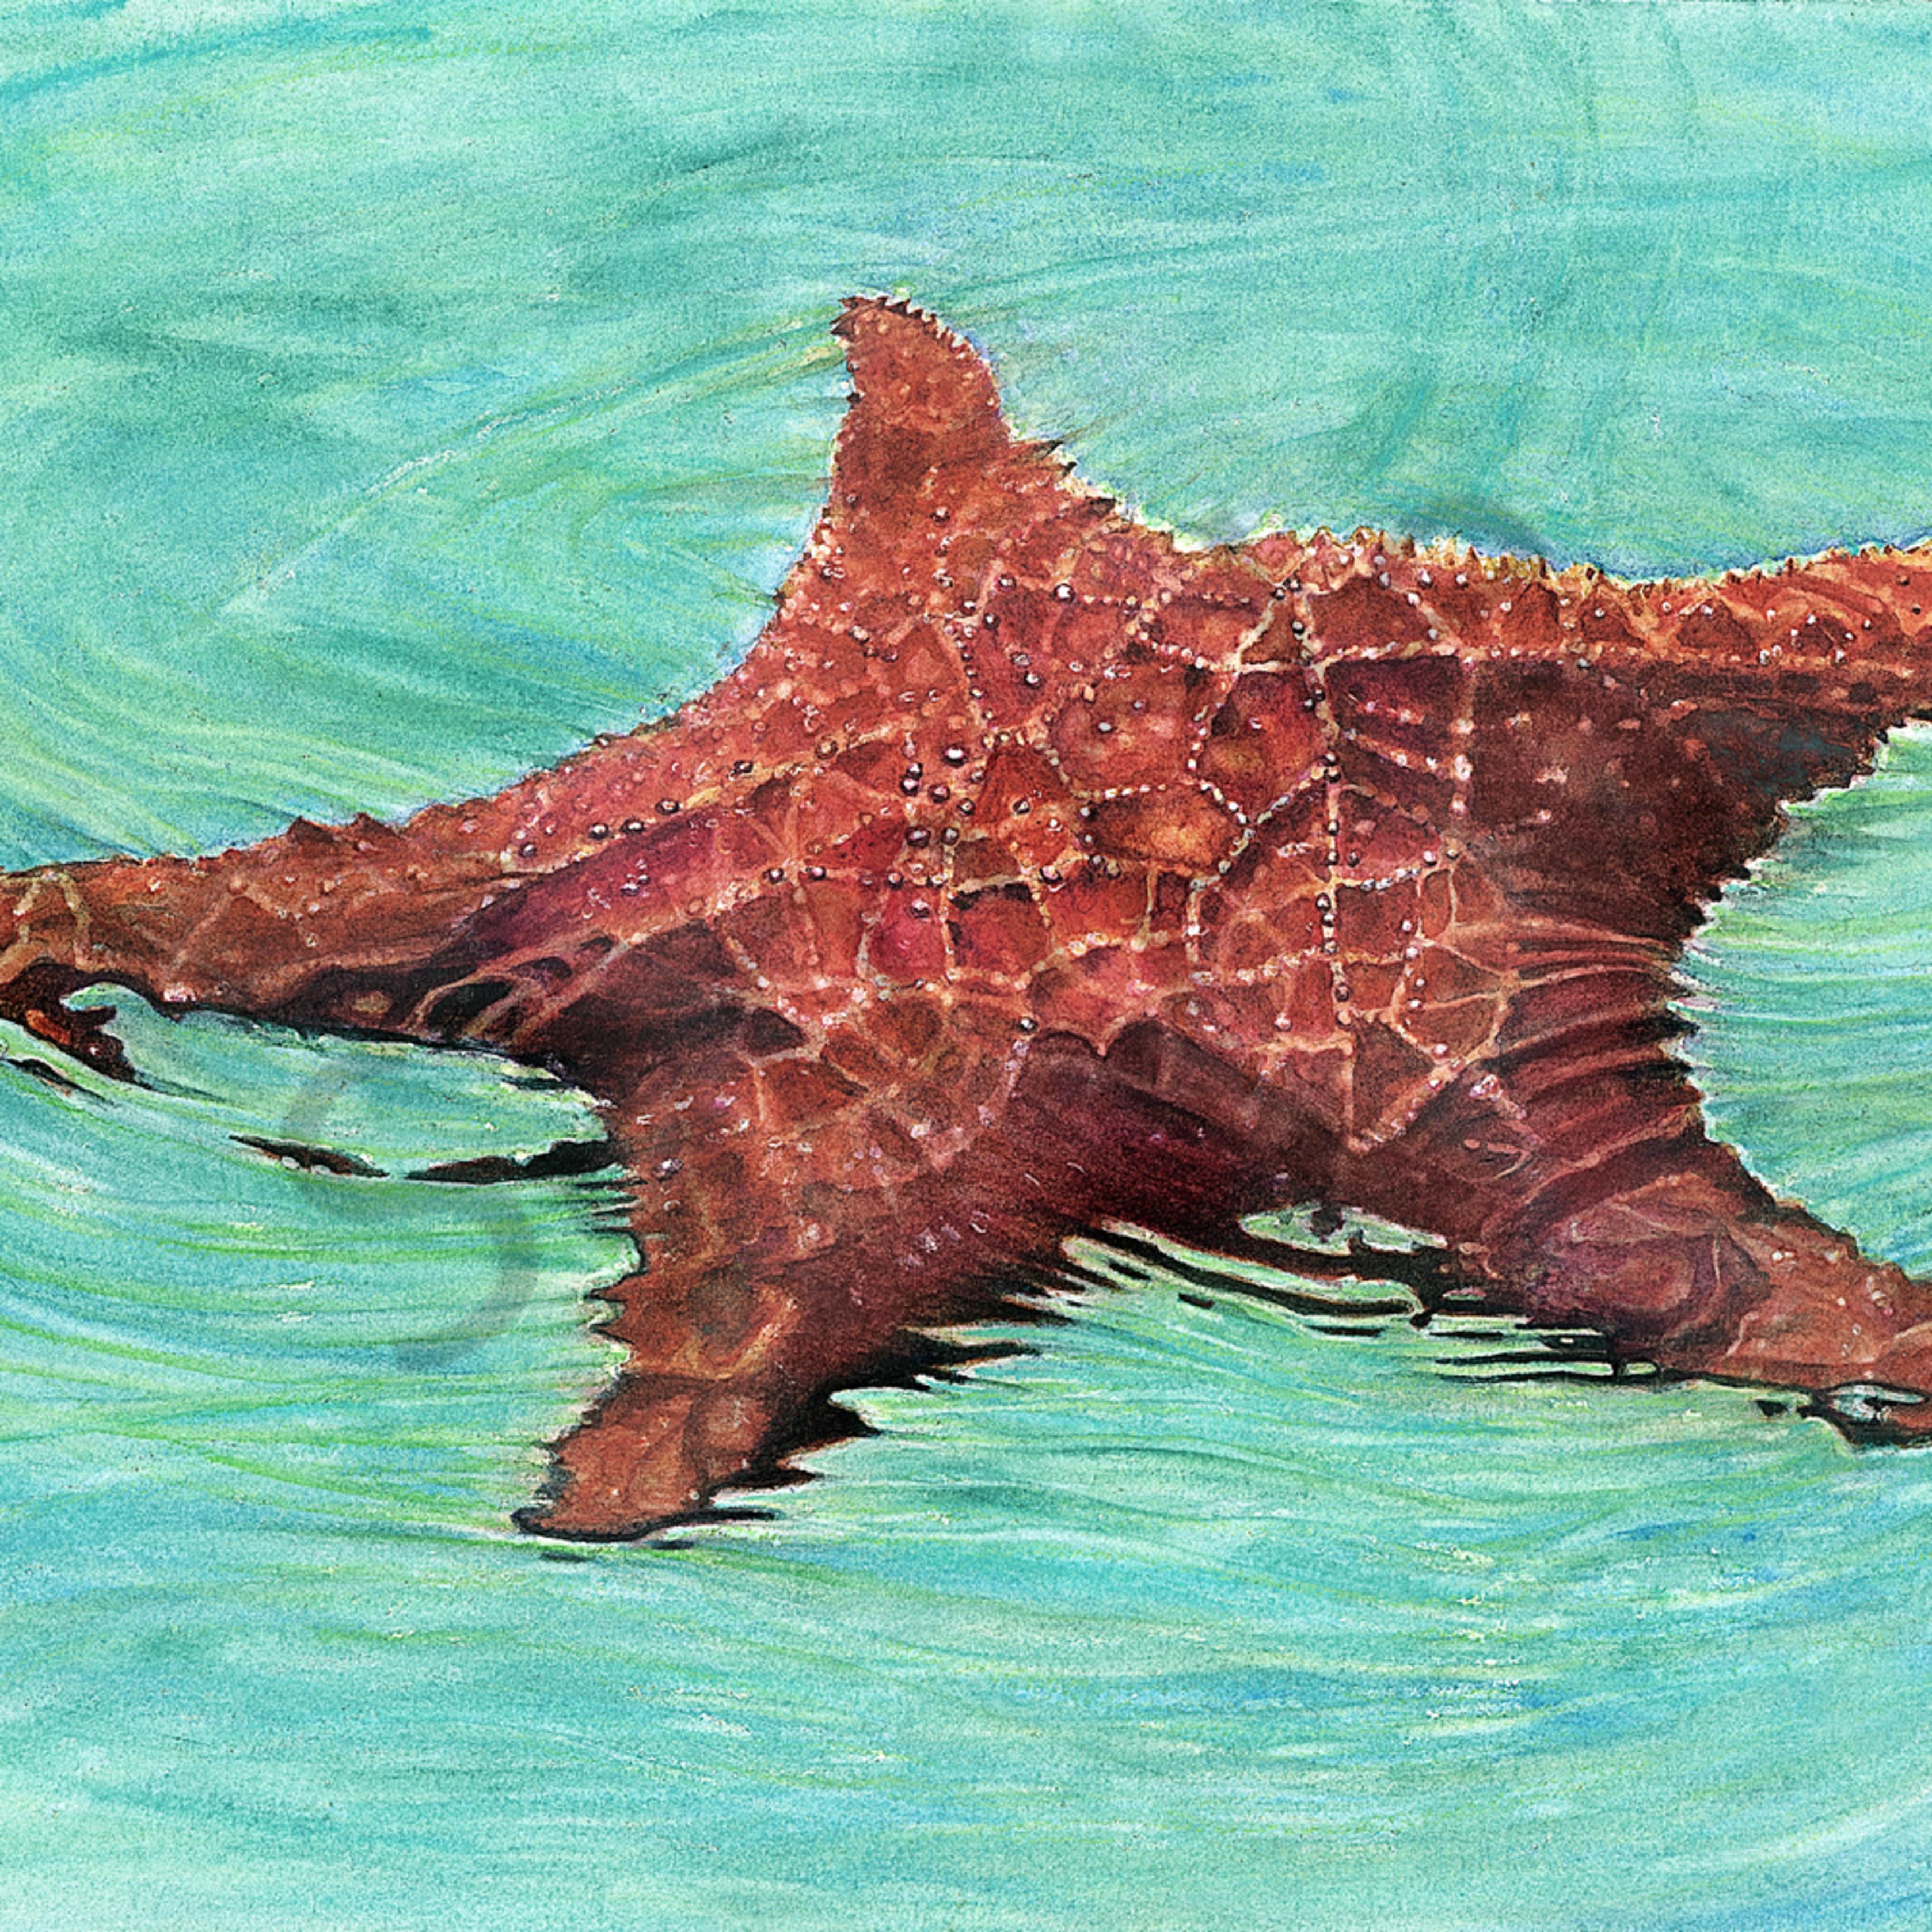 Sea star 1 ebrsck